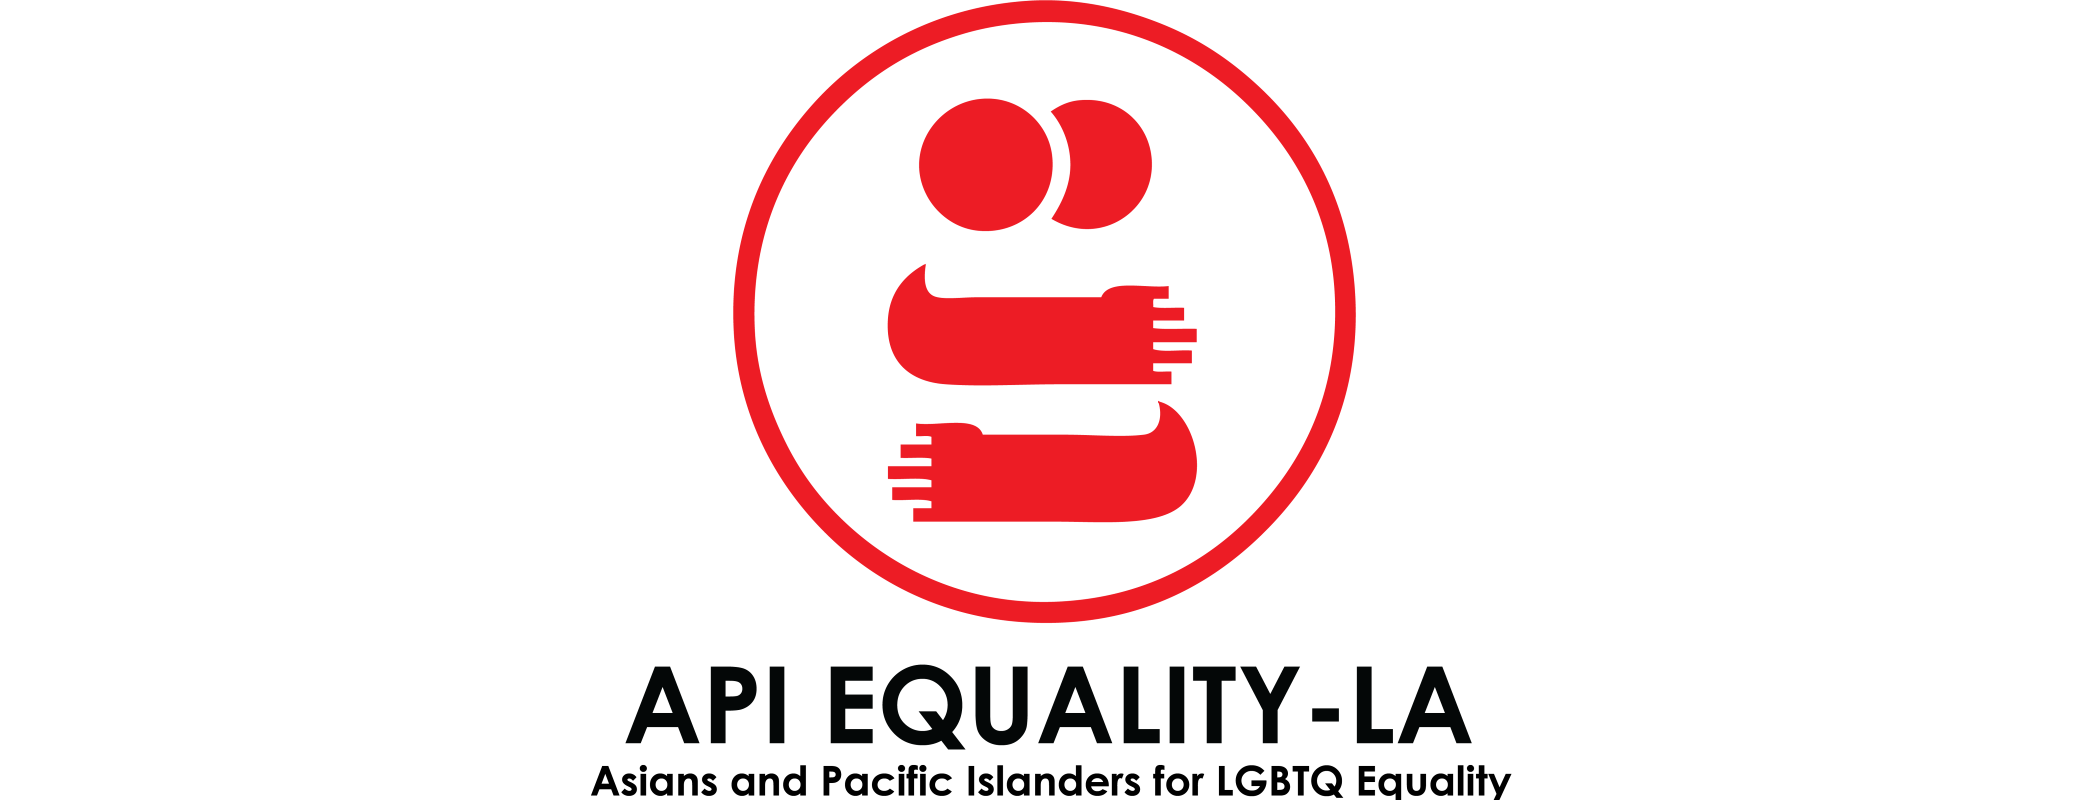 - APIEquality LA1137 Wilshire Blvd #101Los Angeles, CA 90017apiequalityla.org